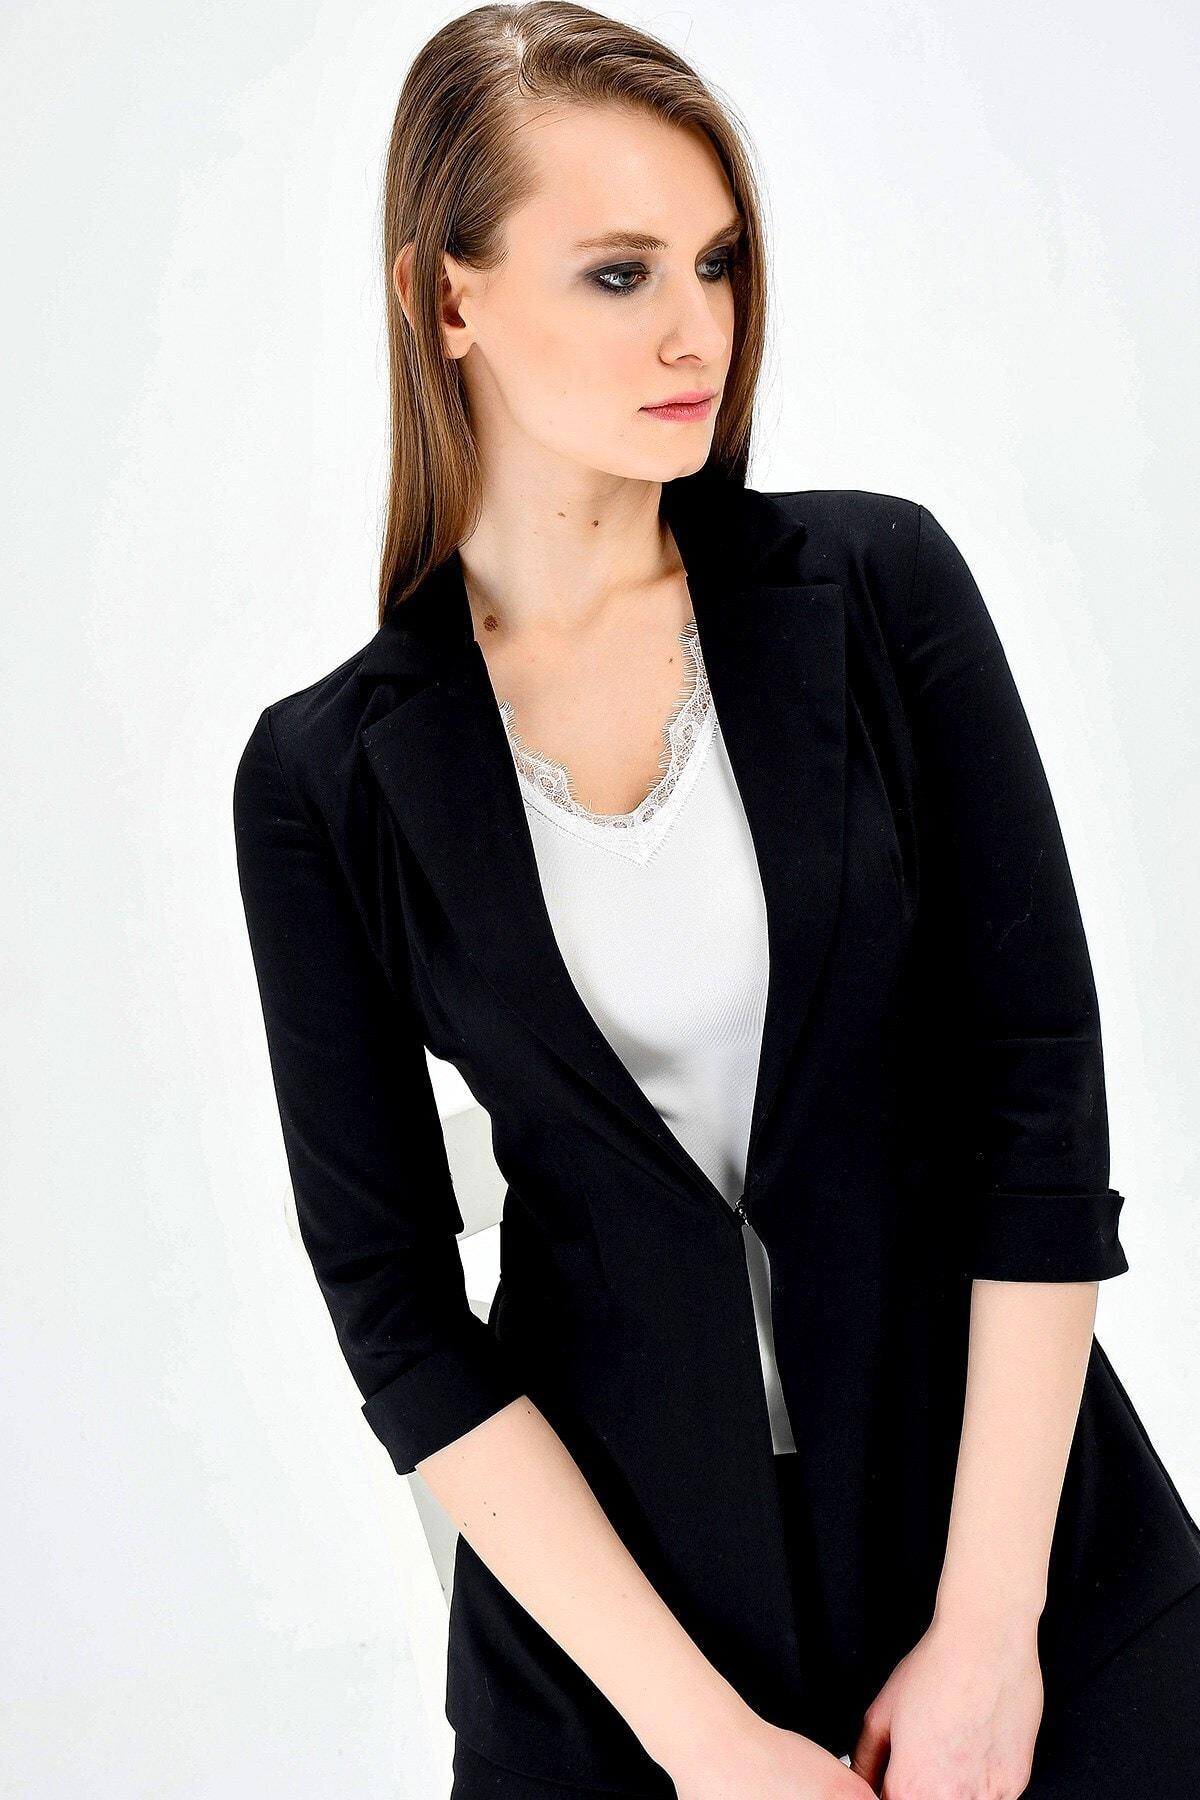 Jument Kadın Normal Bel Cepli Bilek Boy Ofis Likralı Kumaş Pantolon-siyah 2